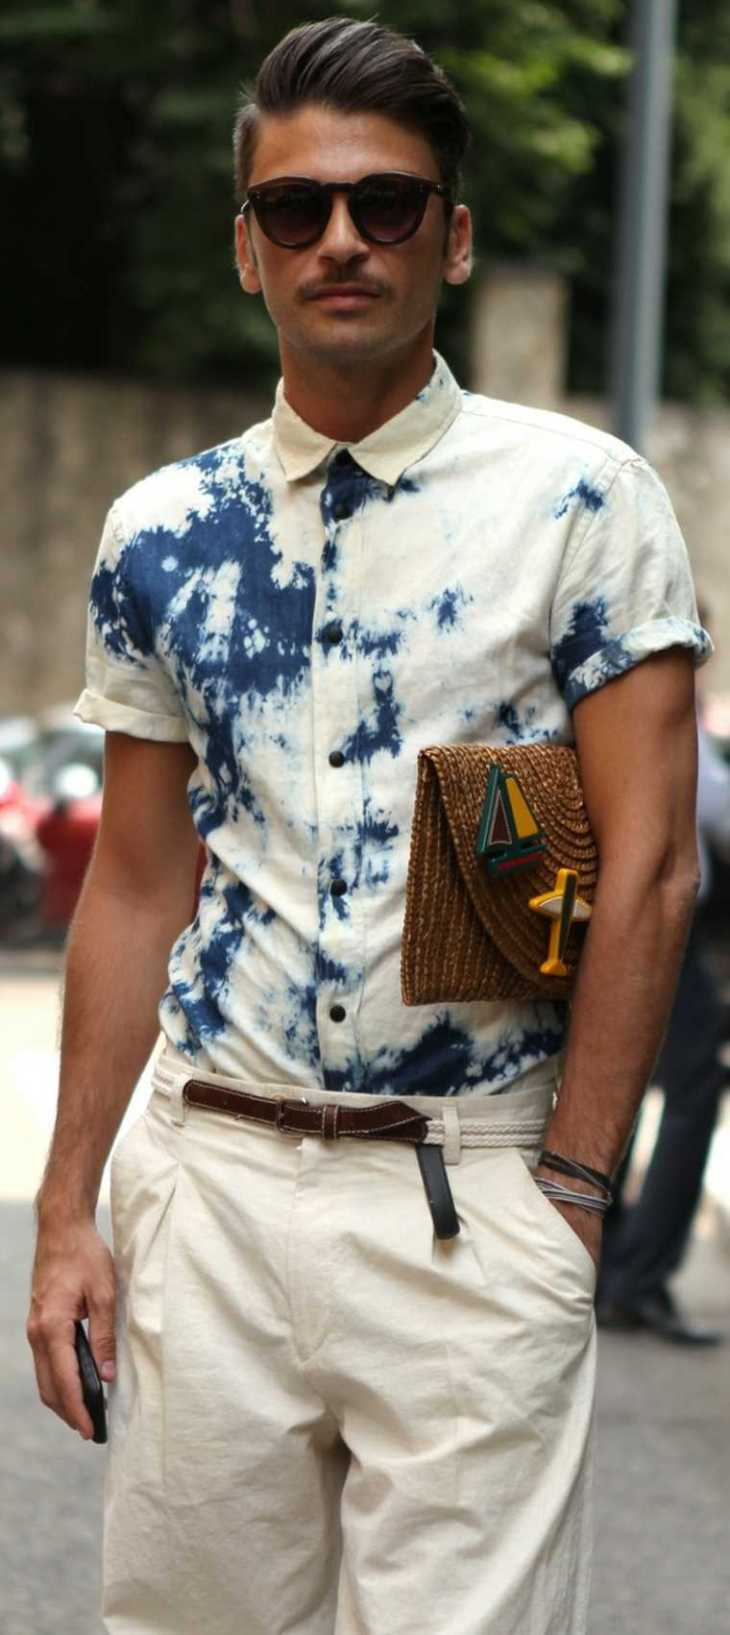 mode homme tendance chemise pantalon blanc tendance